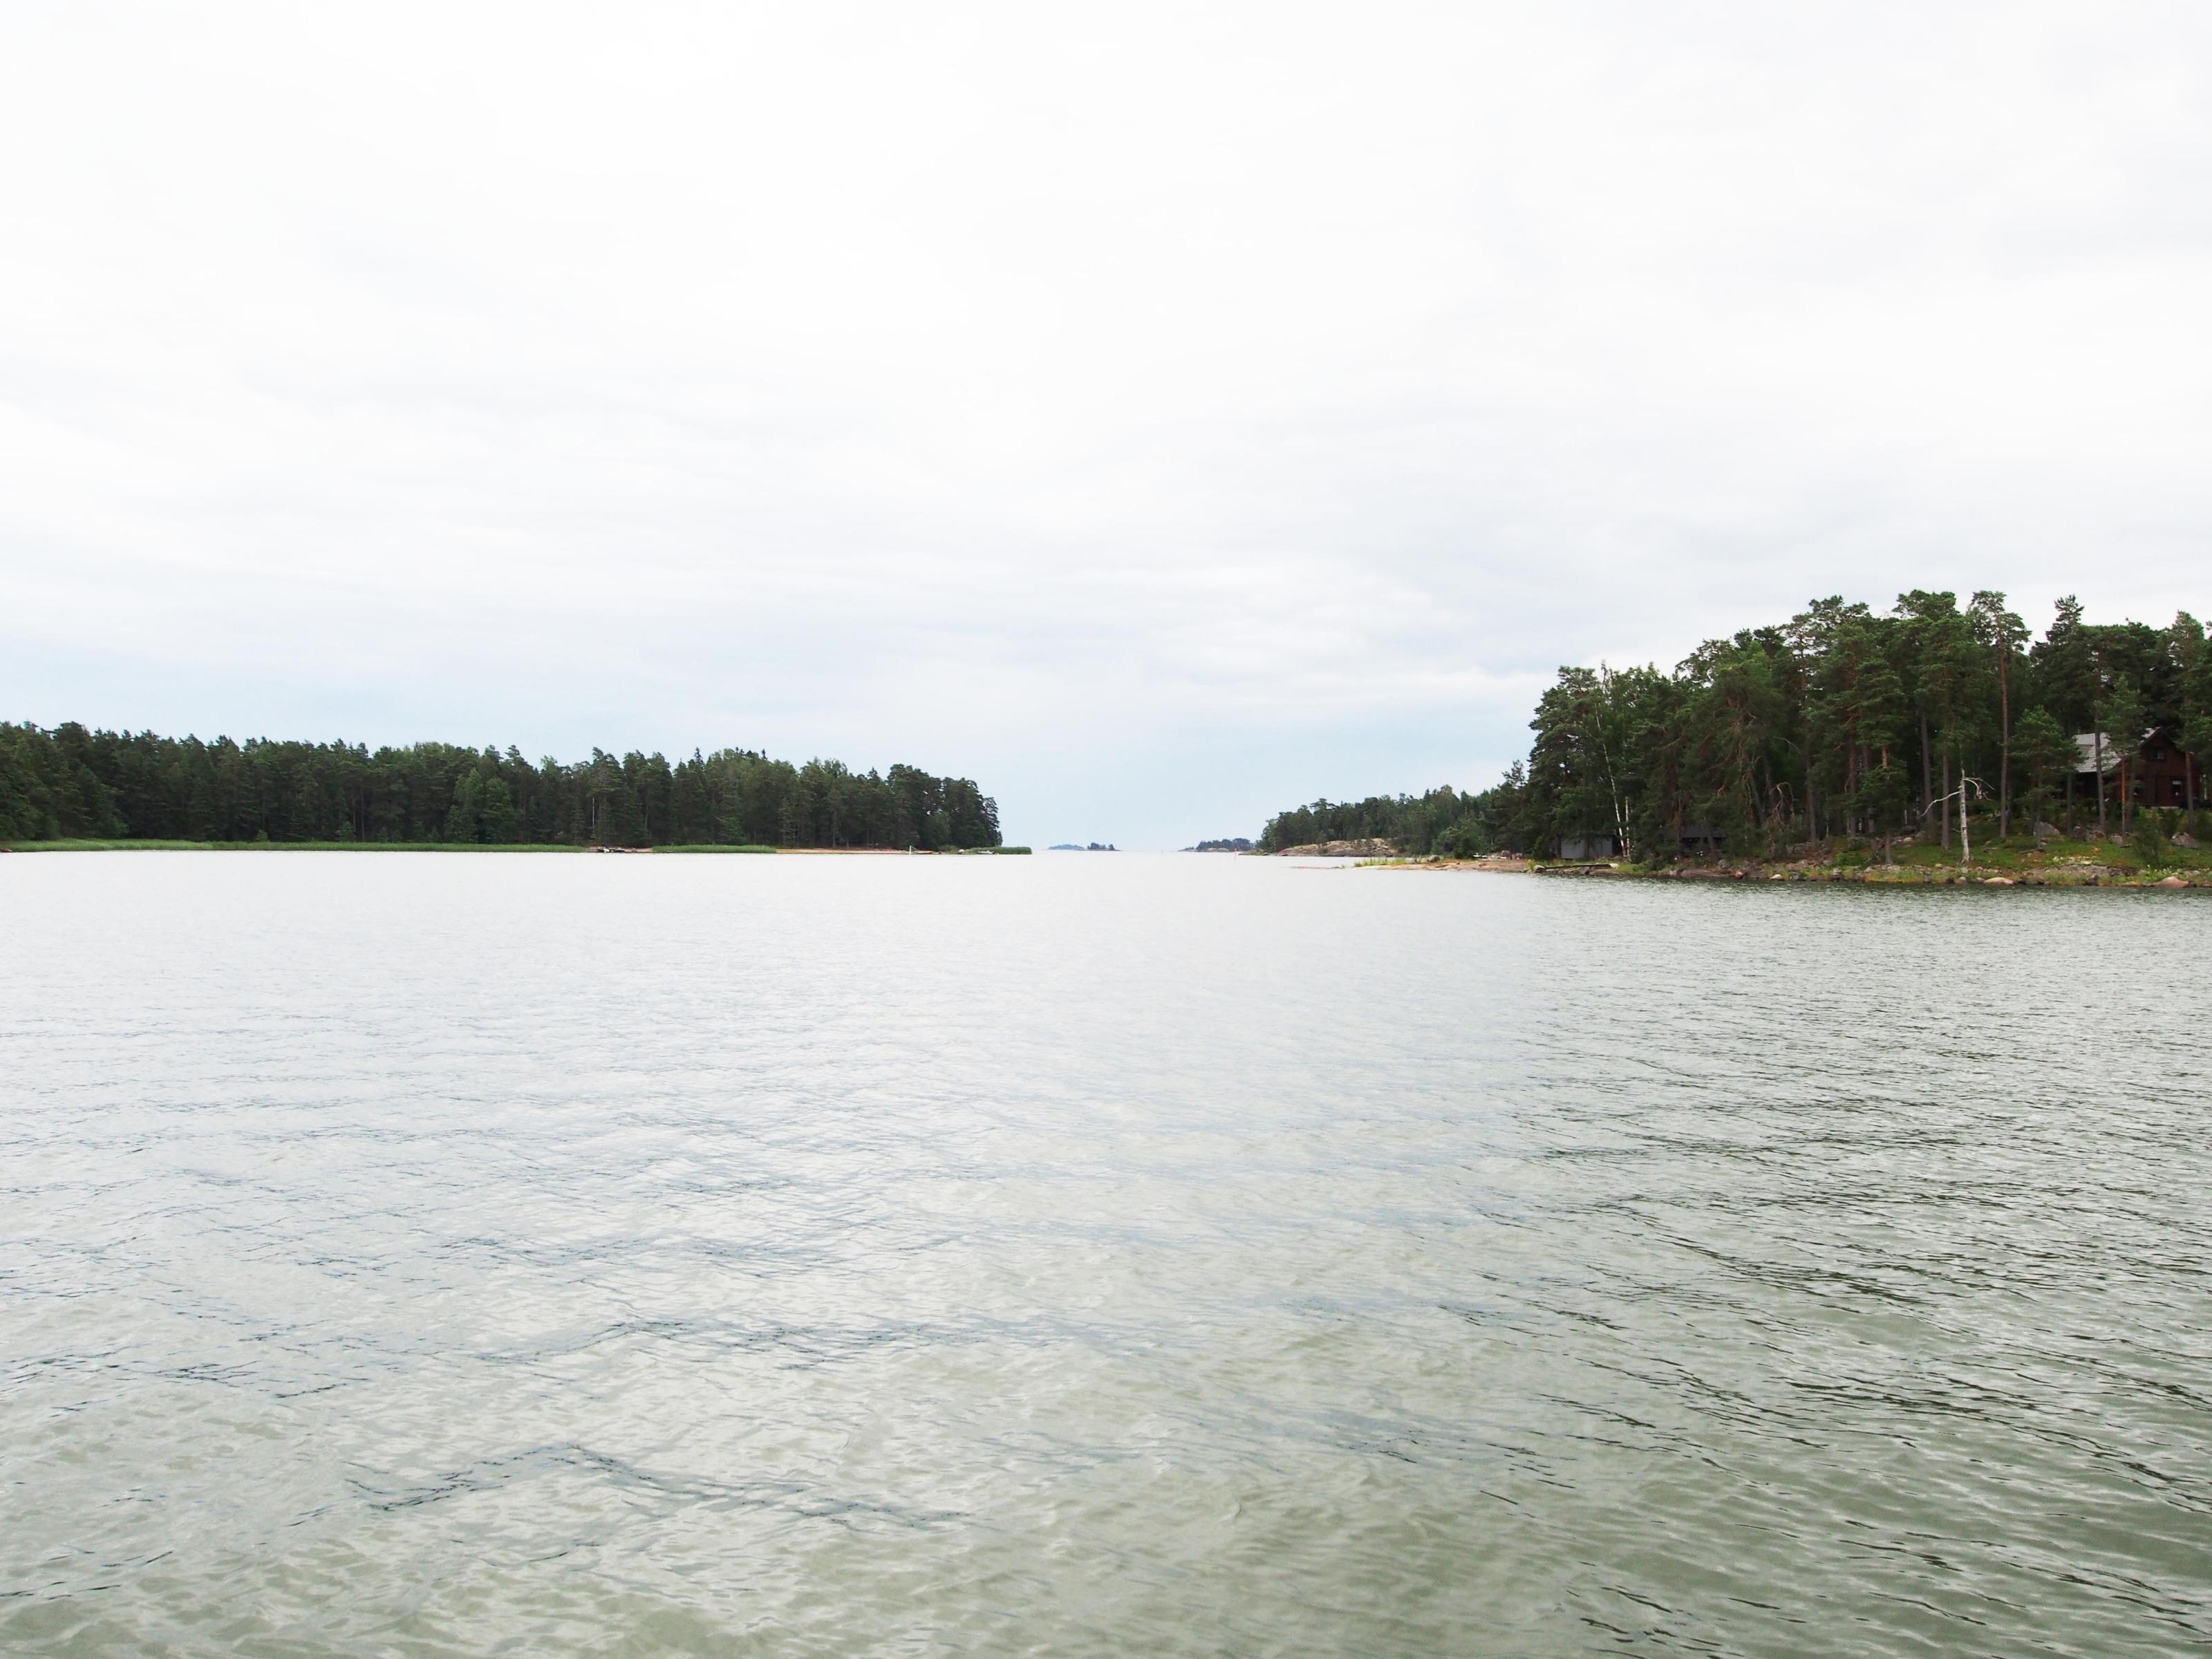 Loviisa, Pernaja, Fallholmen